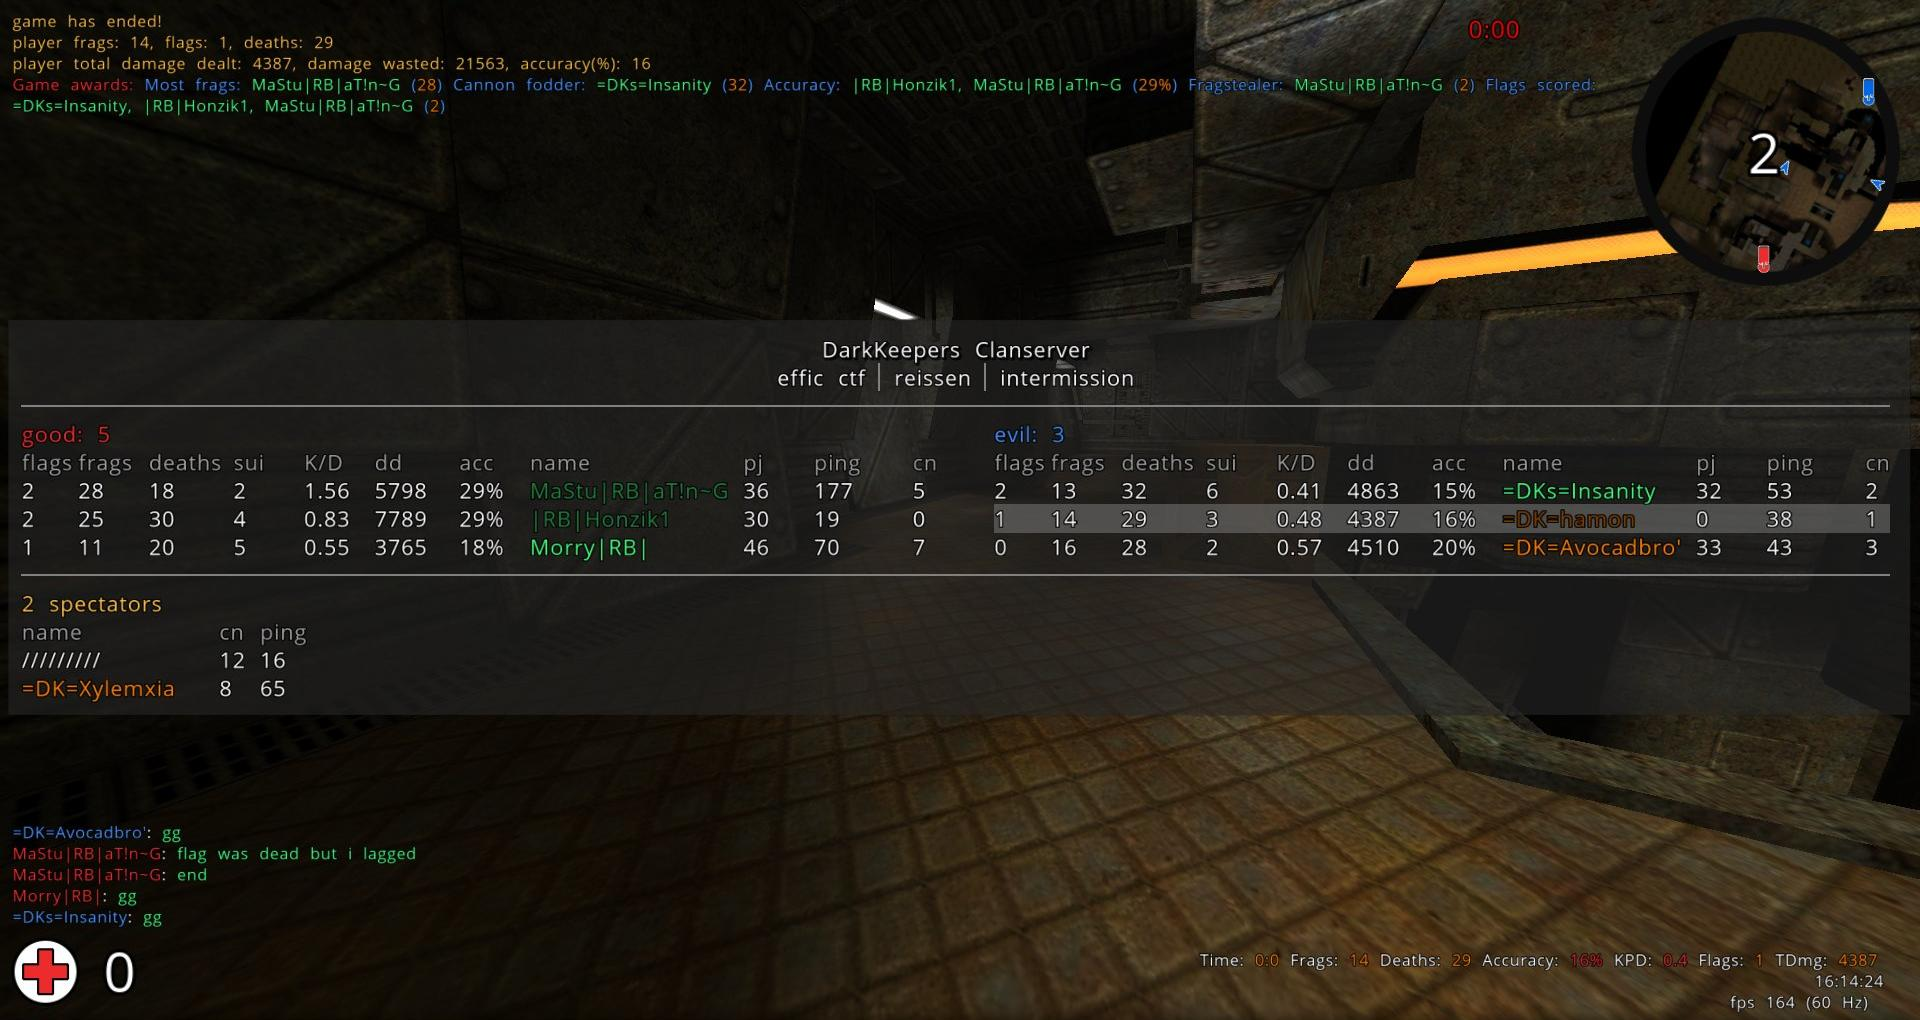 https://darkkeepers.dk/images/squadmanagement/warscreenshots/thumbs/2016_04_24_DK_vs_RB_efficctf_reissen.jpeg